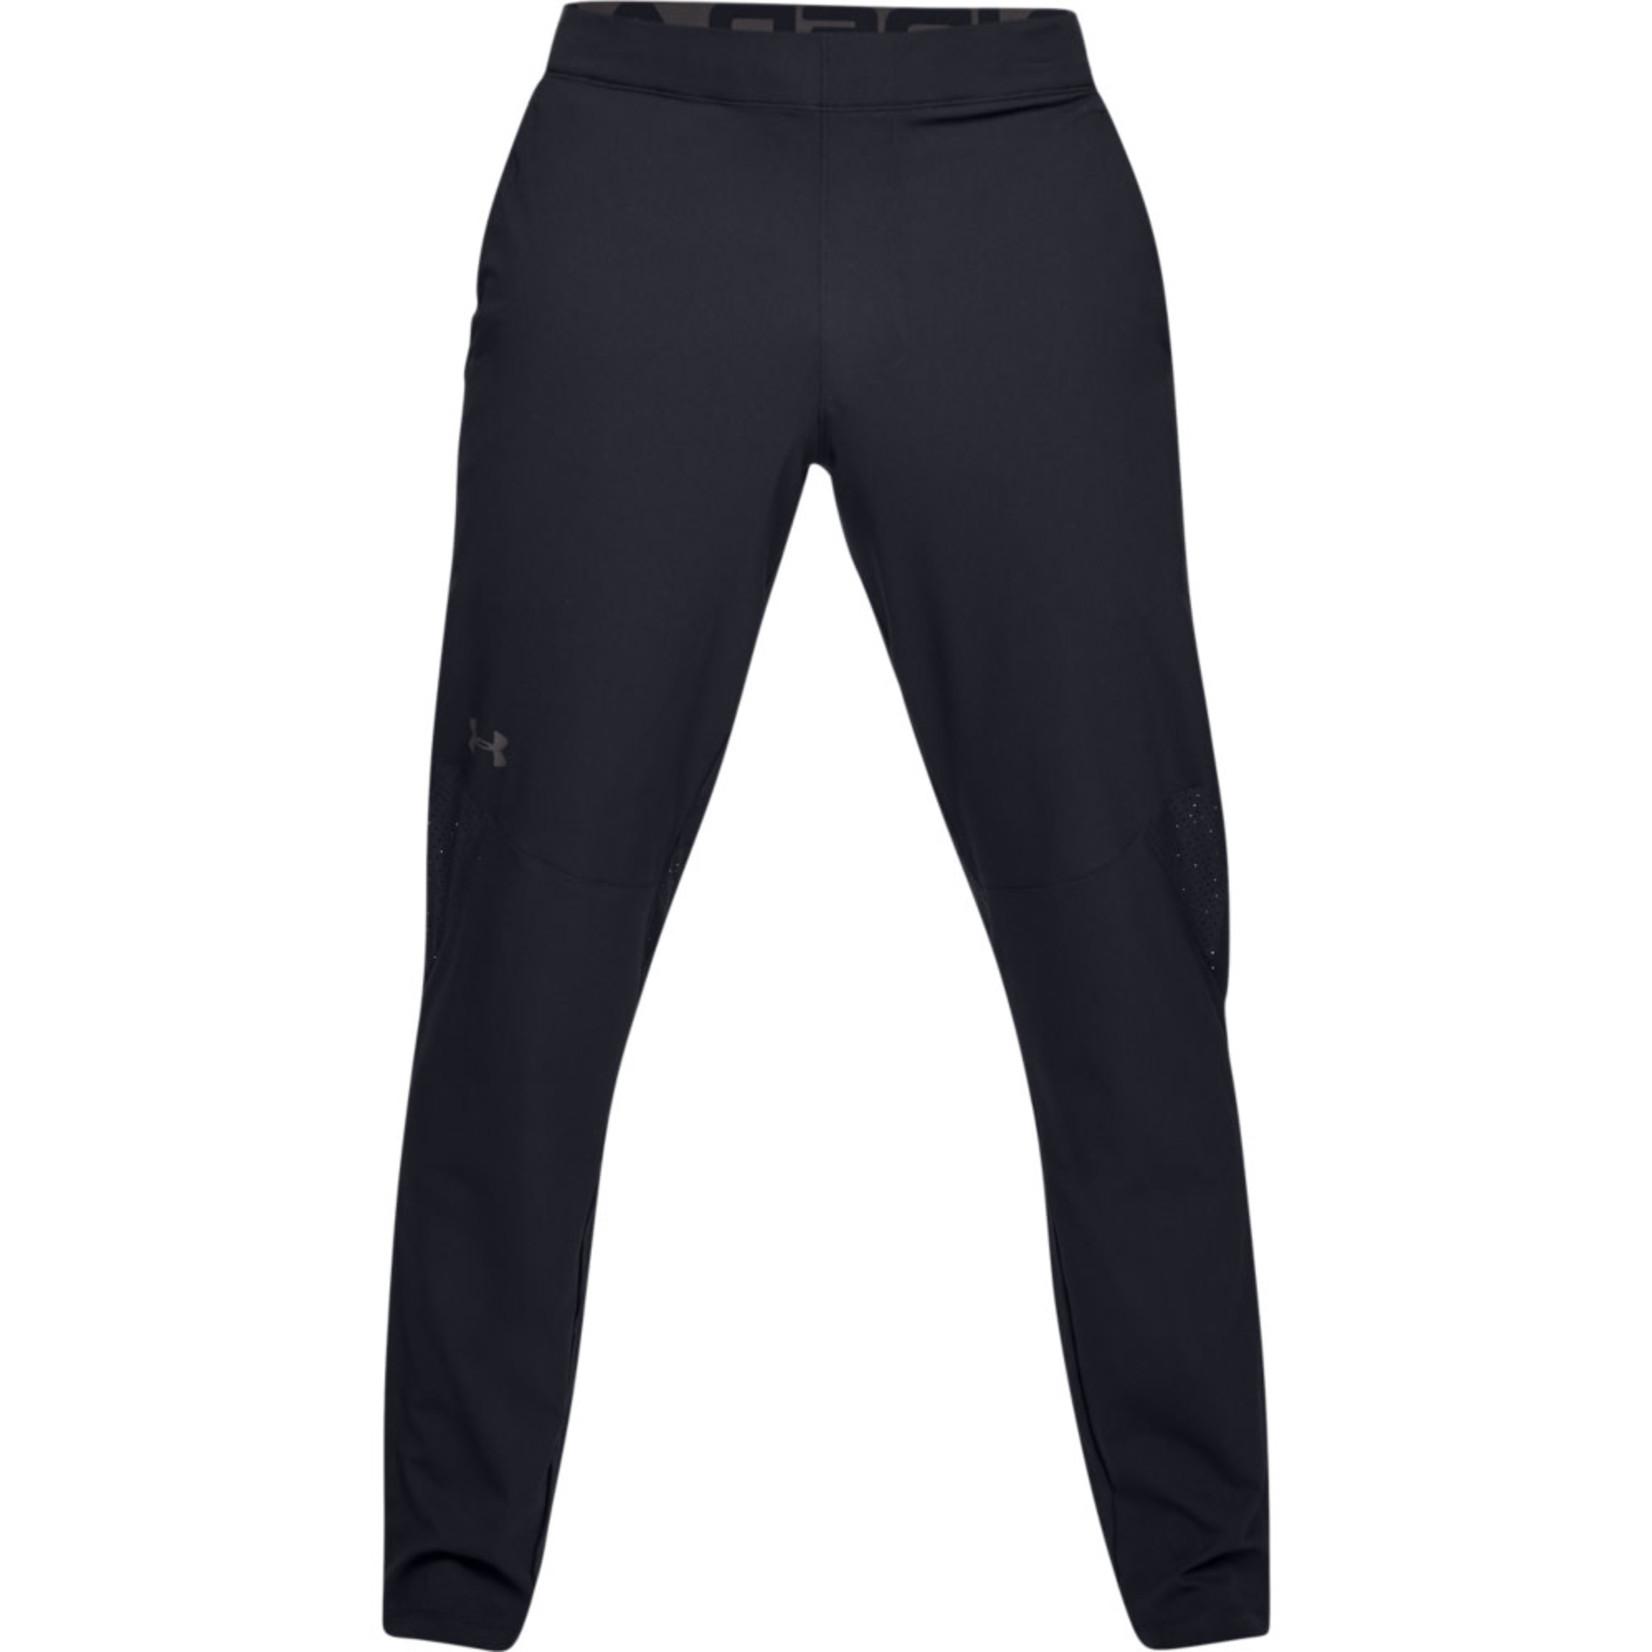 Under Armour Vanish Woven Pants - Black